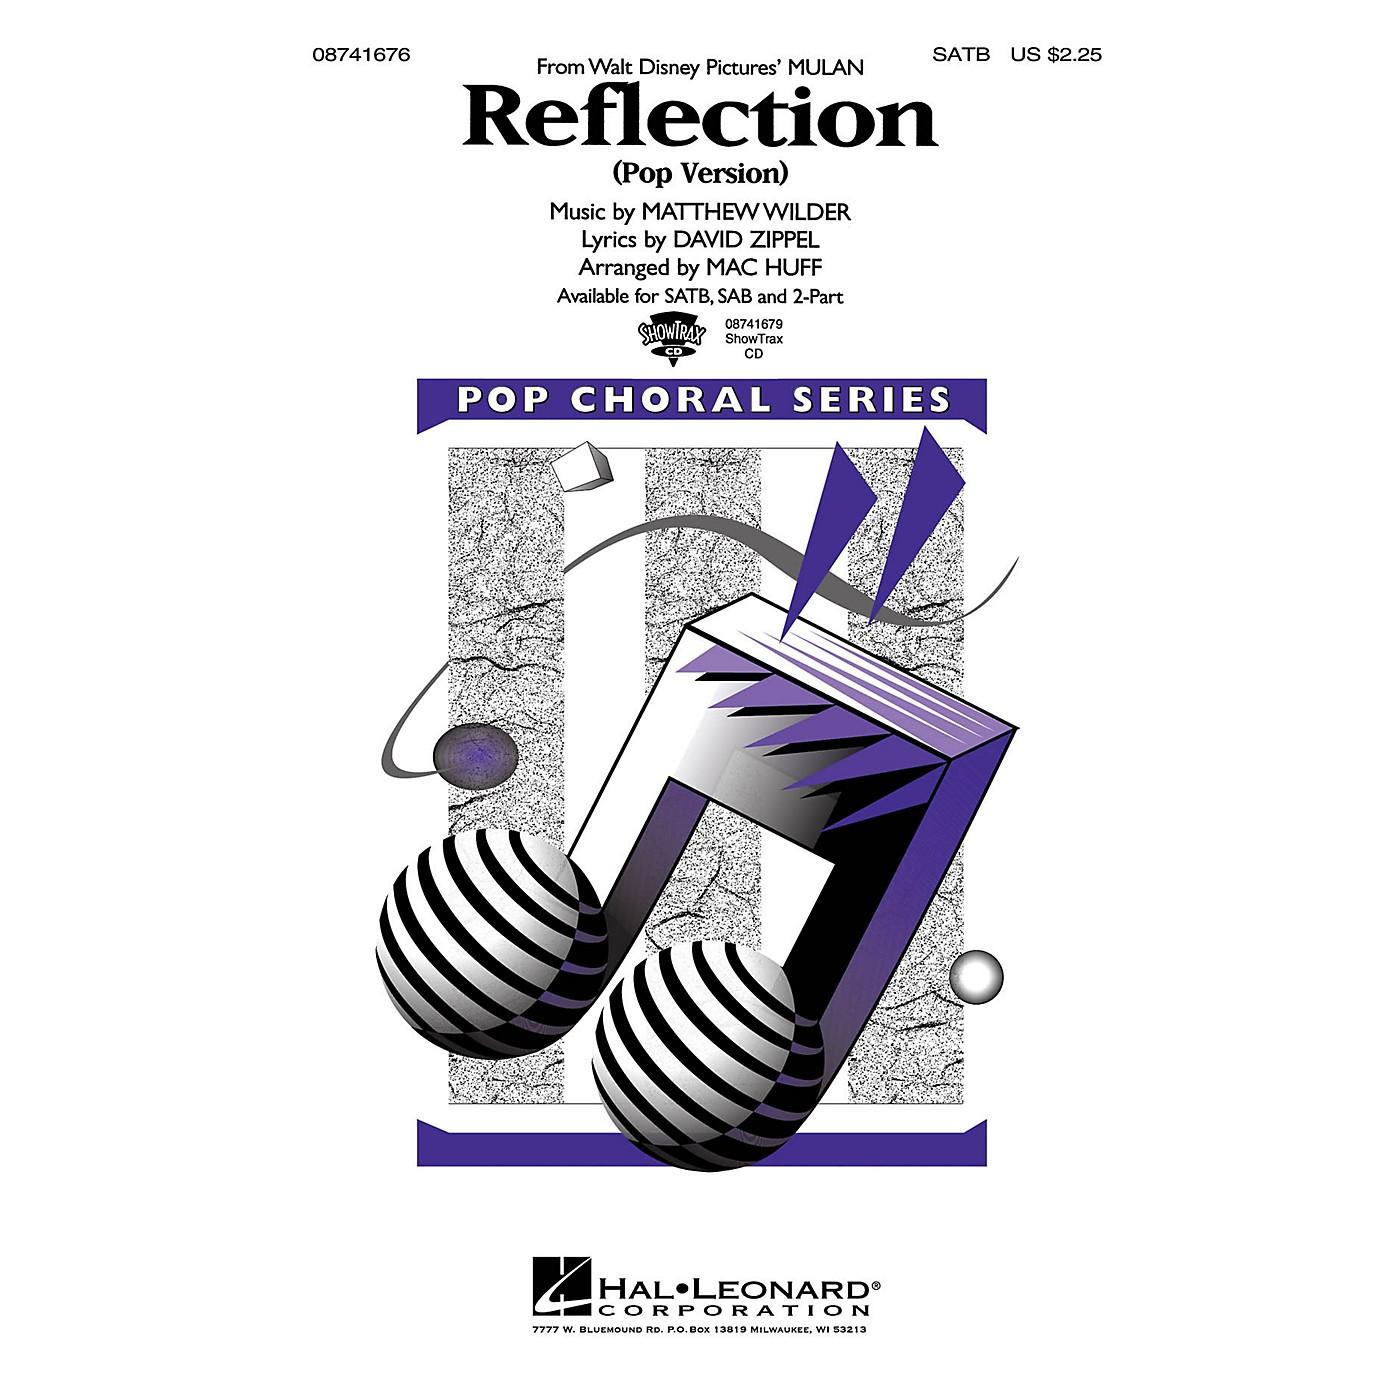 Hal Leonard Reflection (Pop Version) (from Mulan) SATB arranged by Mac Huff thumbnail